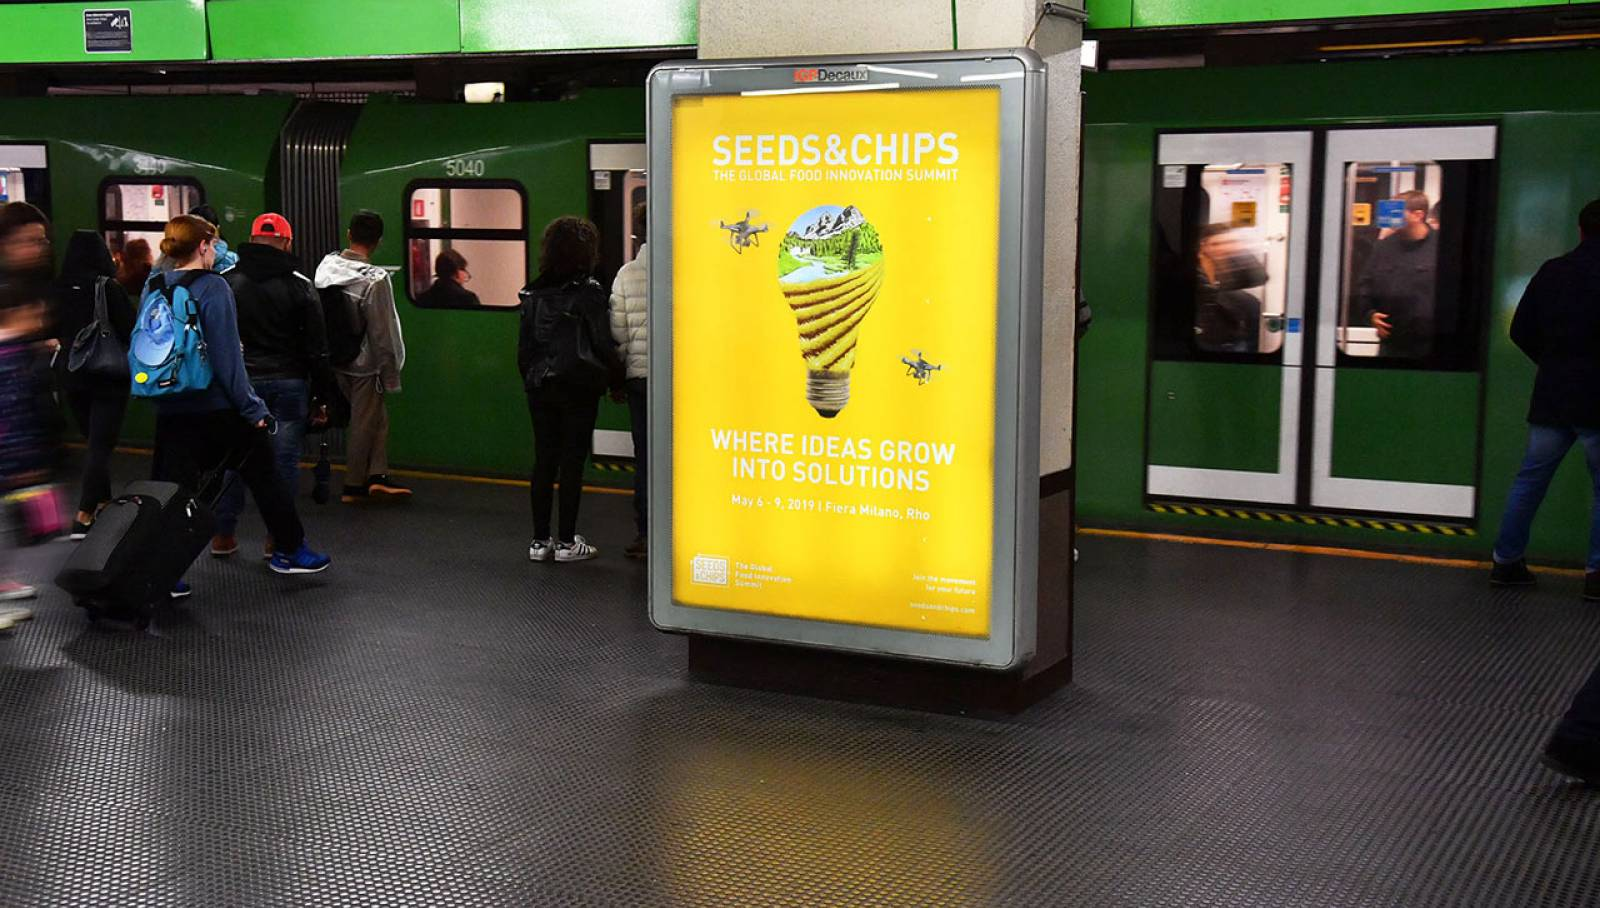 Pubblicità in metropolitana a Milano circuito a copertura portrait IGPDecaux per Seeds&Chips